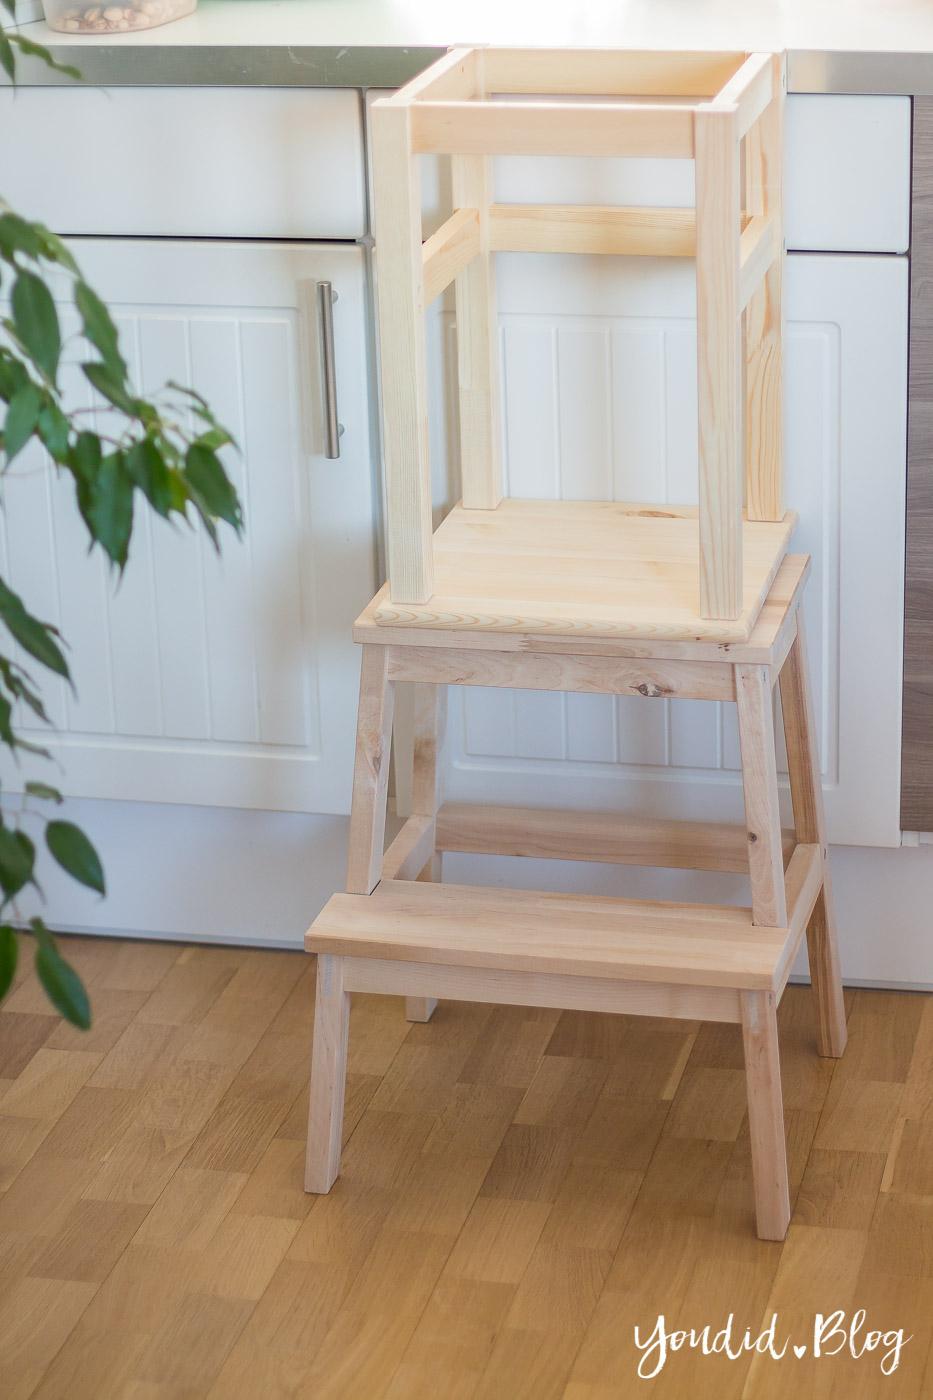 ikea hack diy learning tower selber bauen bauanleitung. Black Bedroom Furniture Sets. Home Design Ideas